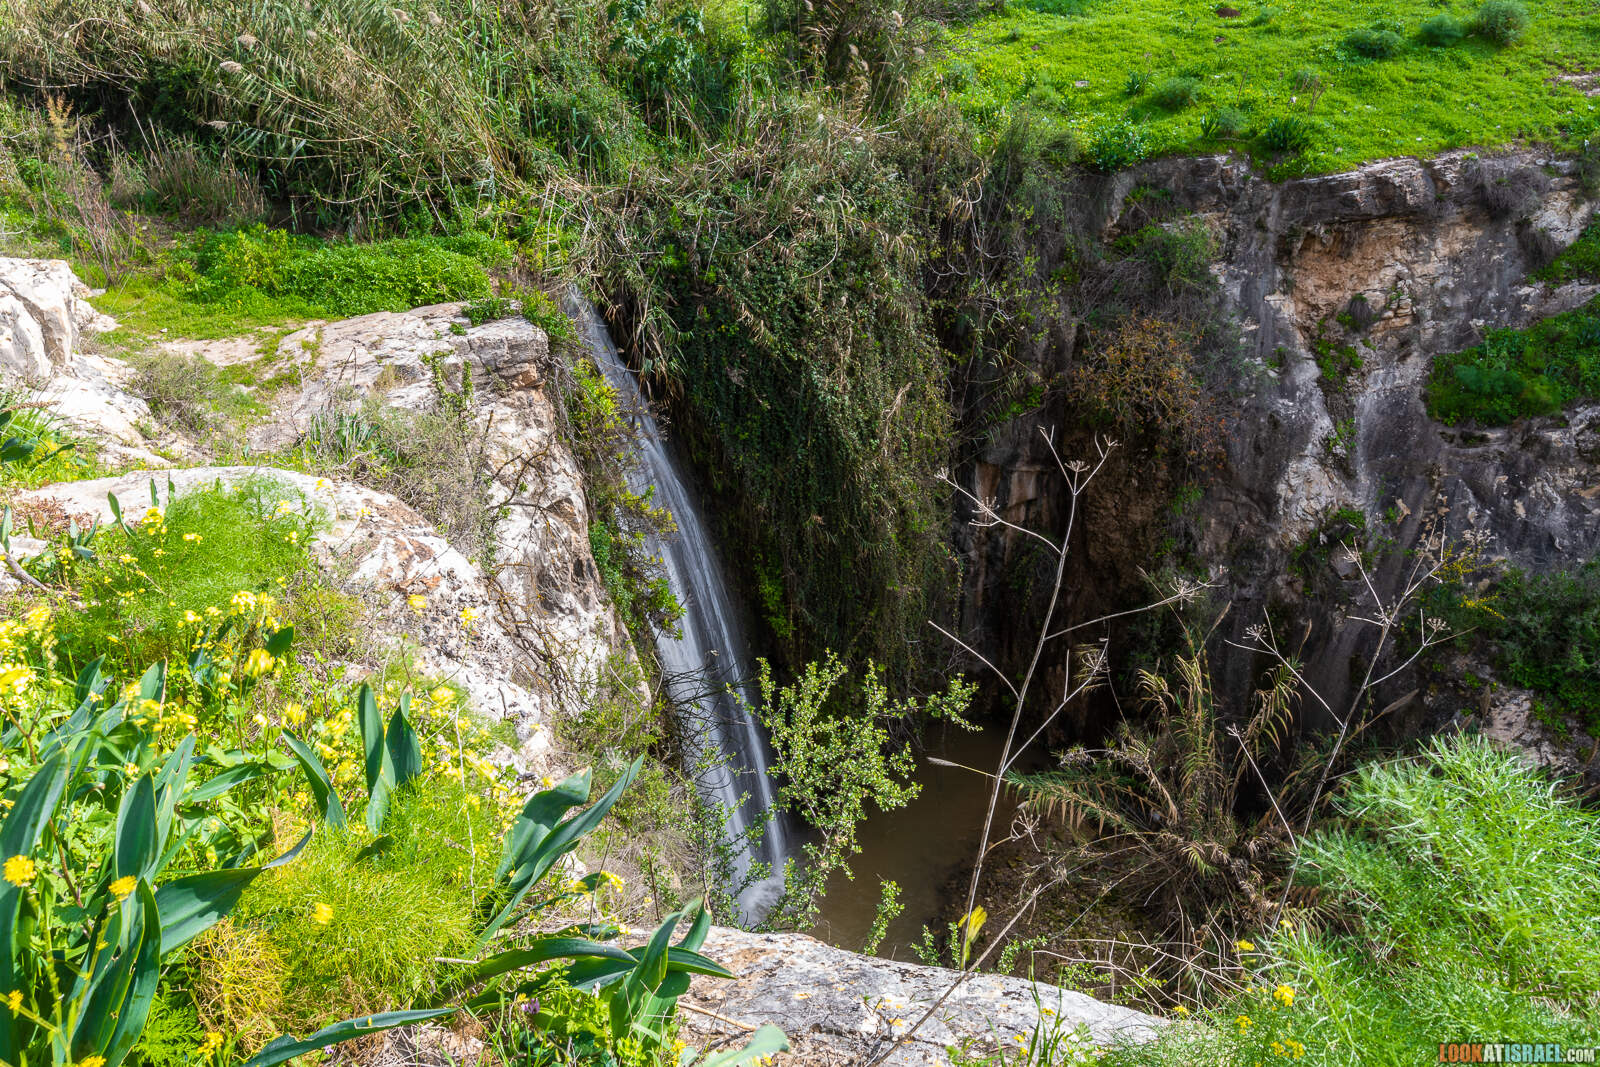 Водопад Мейцар на Голанских высотах | Meytsar waterfall | מפל מיצר | LookAtIsrael.com - Фото путешествия по Израилю